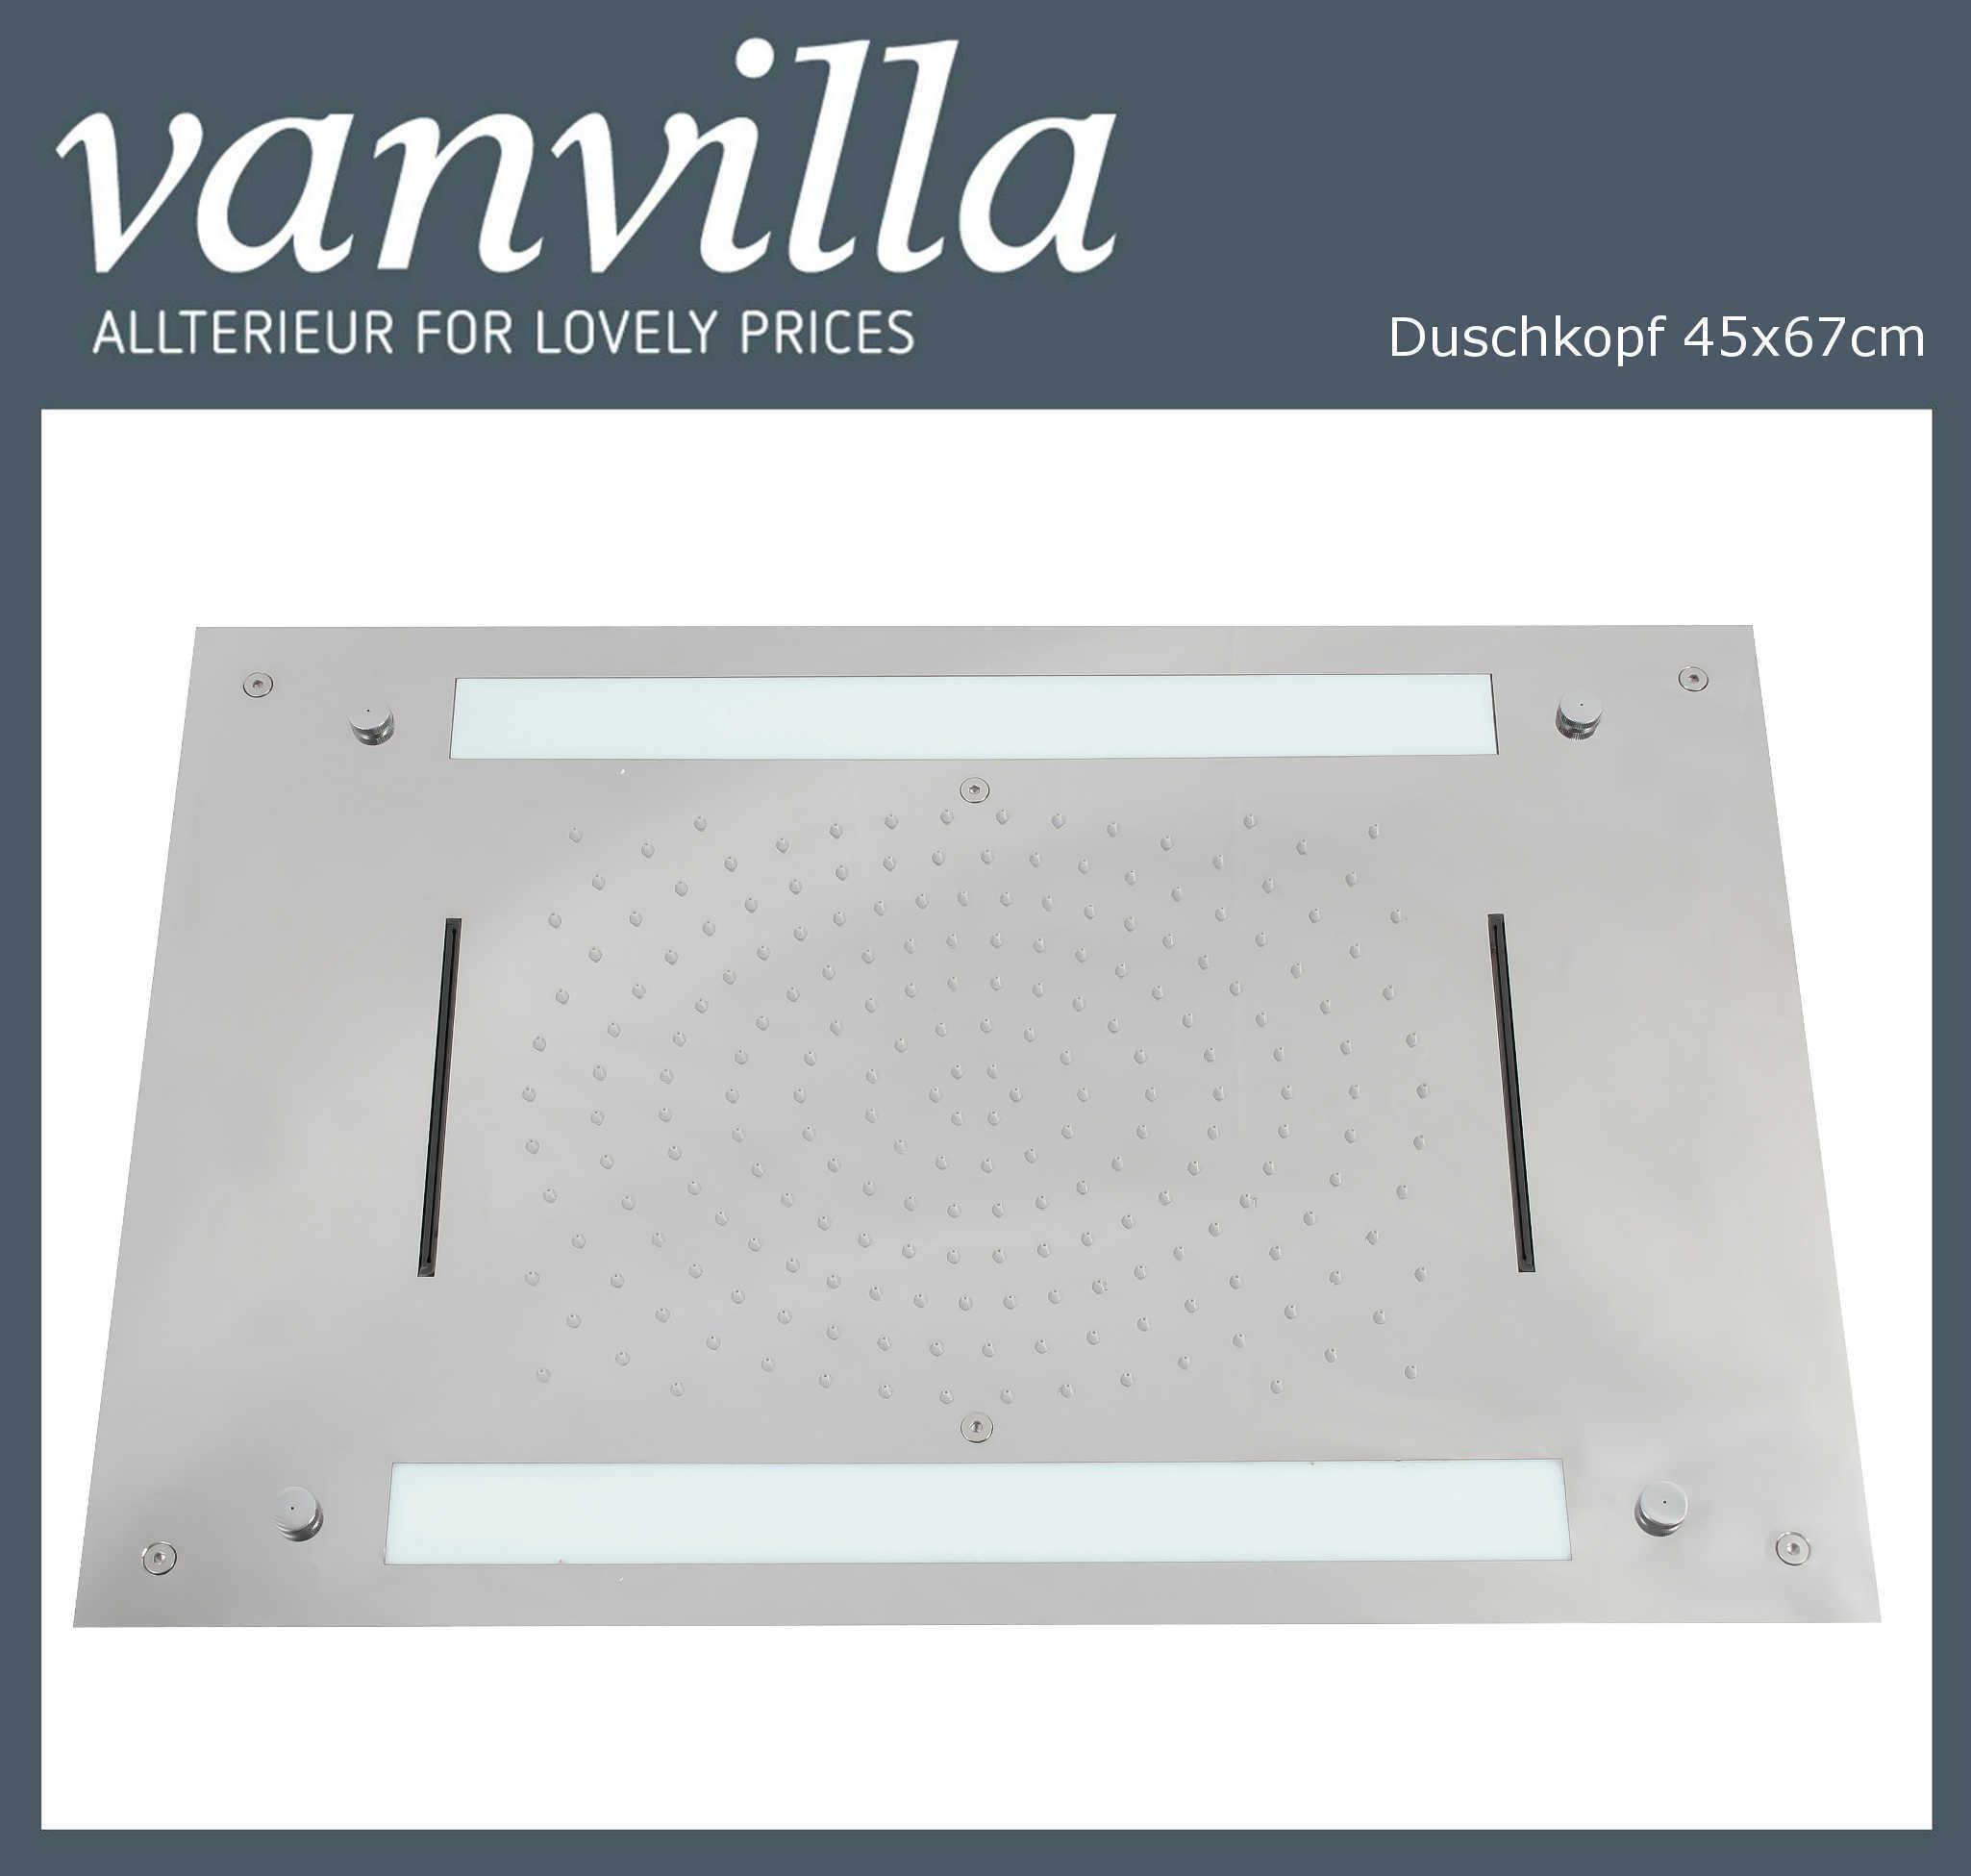 Duschkopf vanvilla LED 45cm x 67cm poliert flächenbündig Einbaubox 114567AW-P